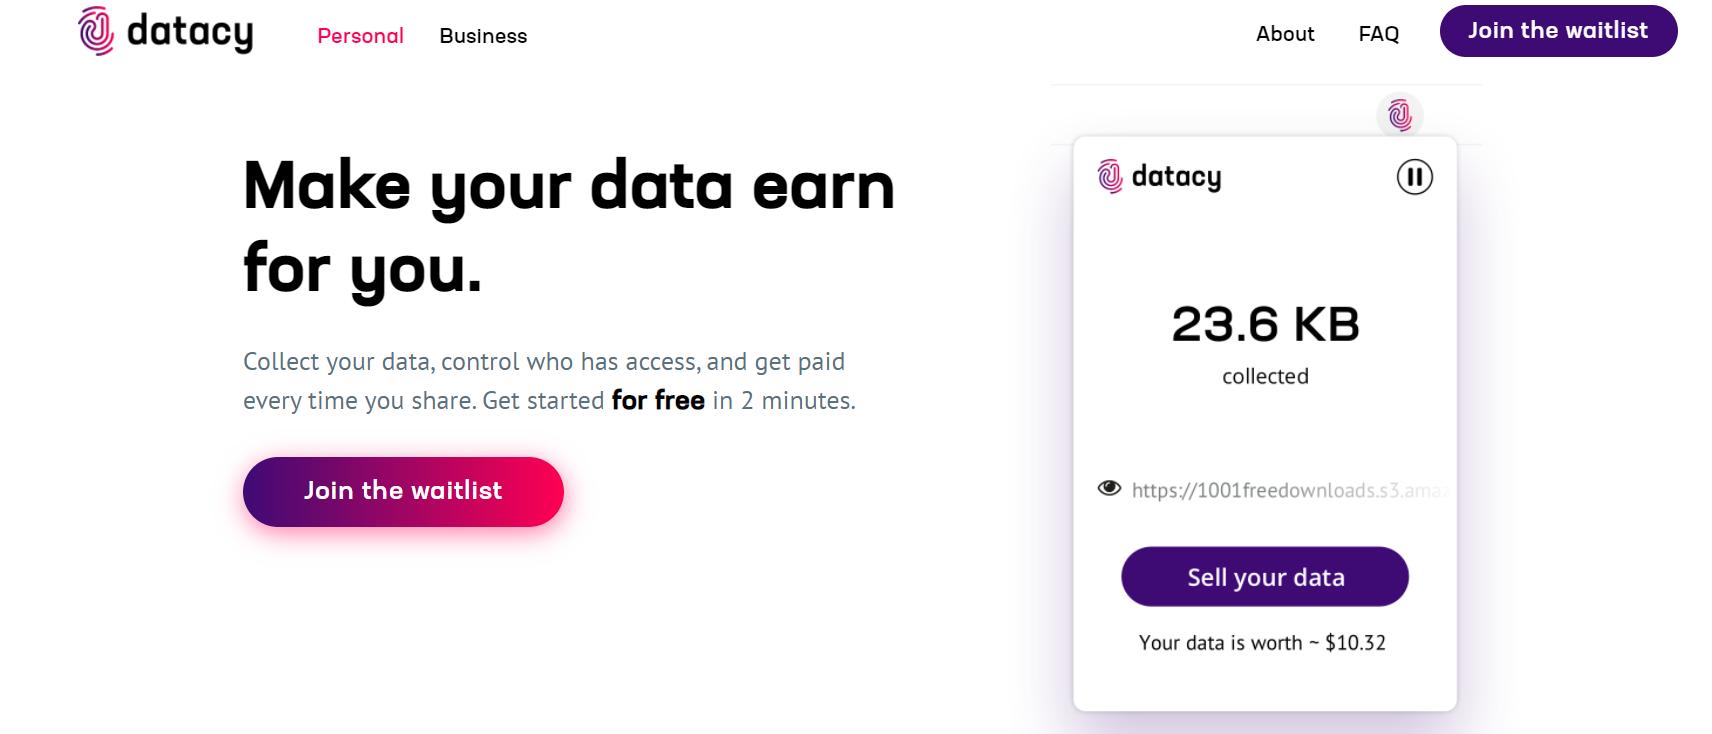 Интерфейс Datacy